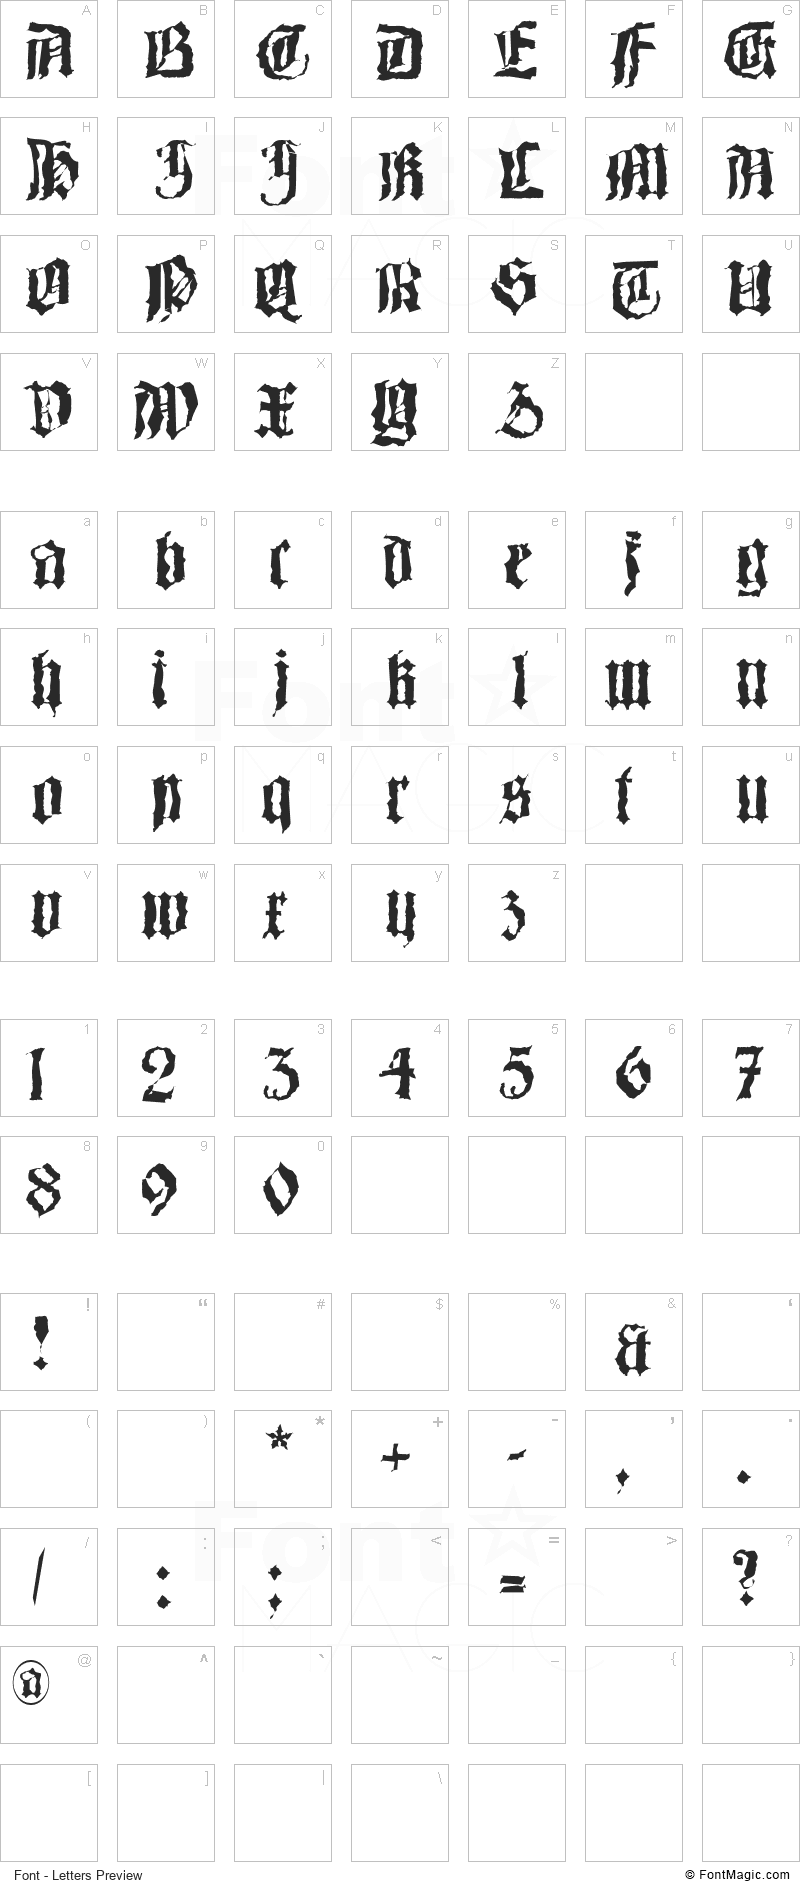 Barlos-Random Font - All Latters Preview Chart